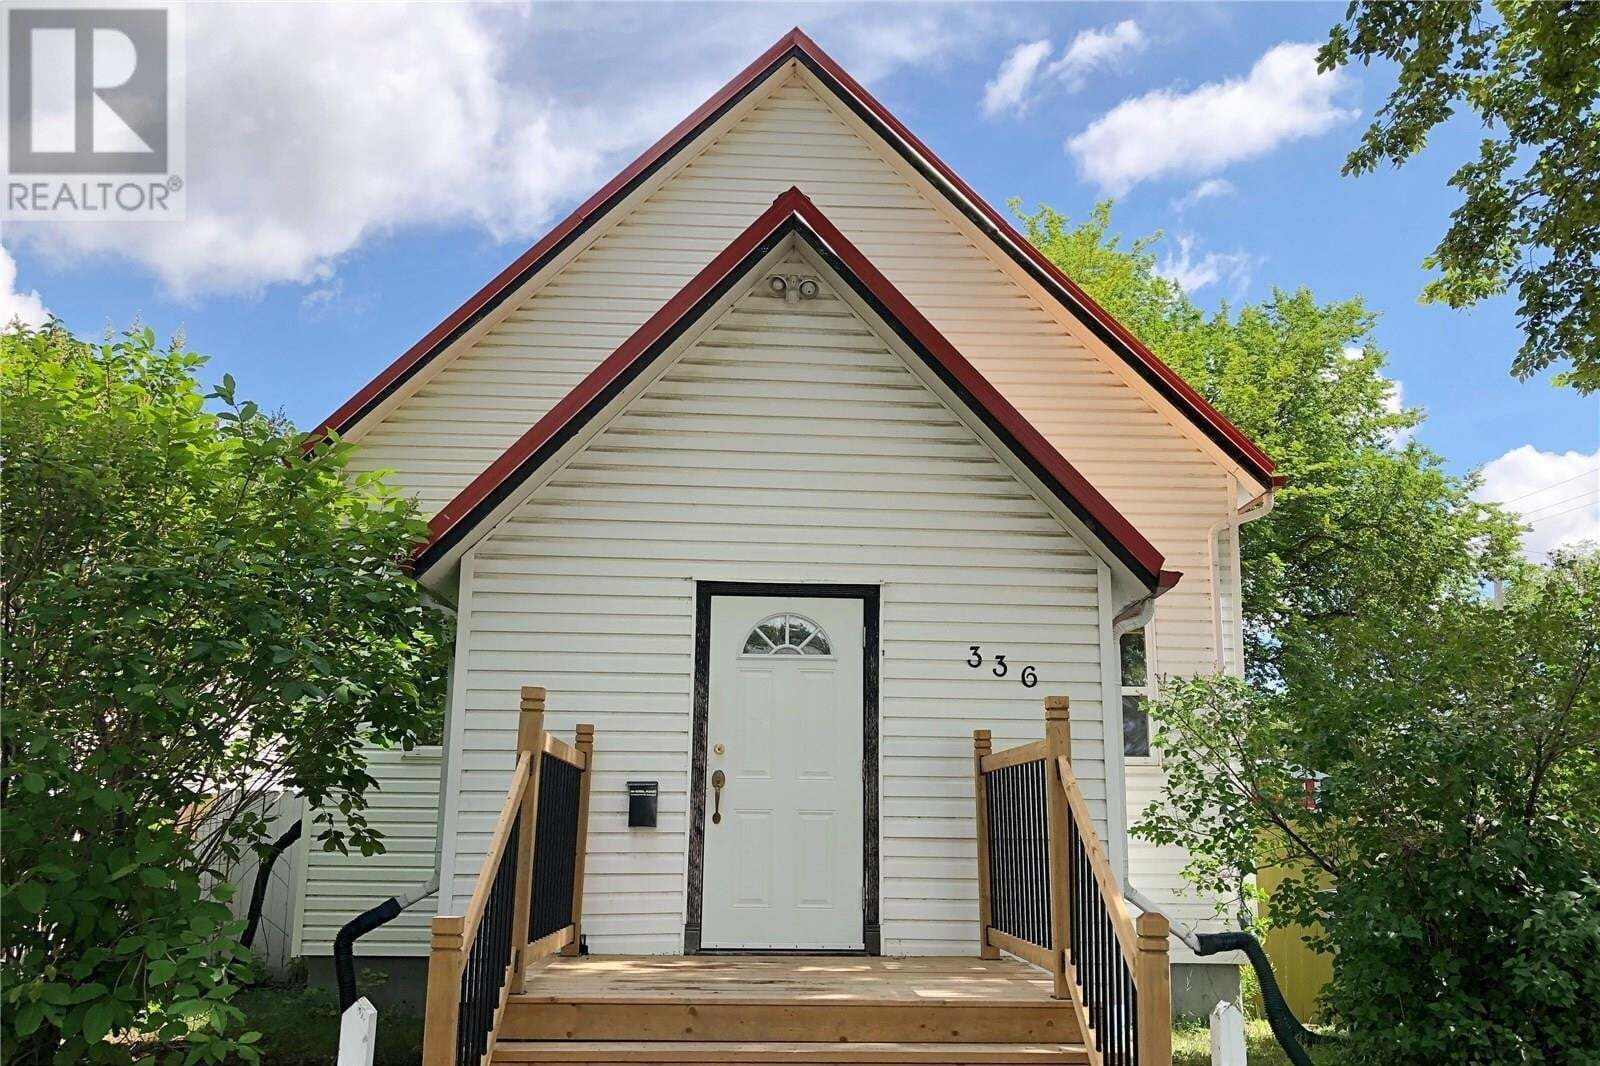 House for sale at 336 I Ave S Saskatoon Saskatchewan - MLS: SK828991